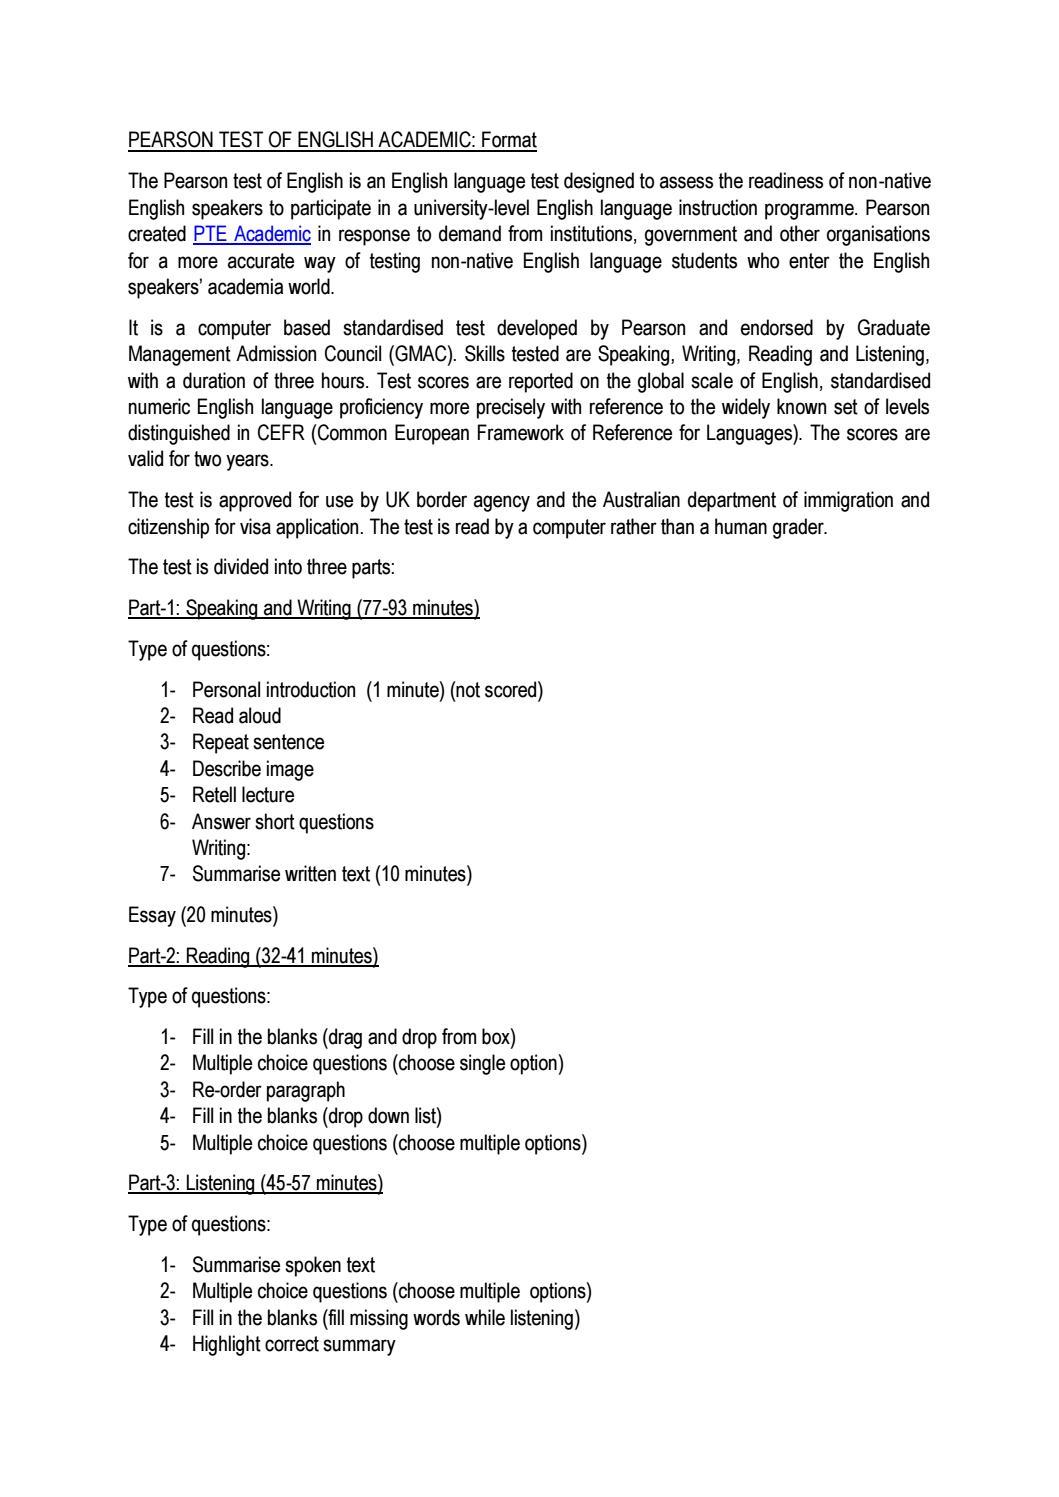 Format of Person Test of English (Academic) Format by ieltsguru - issuu